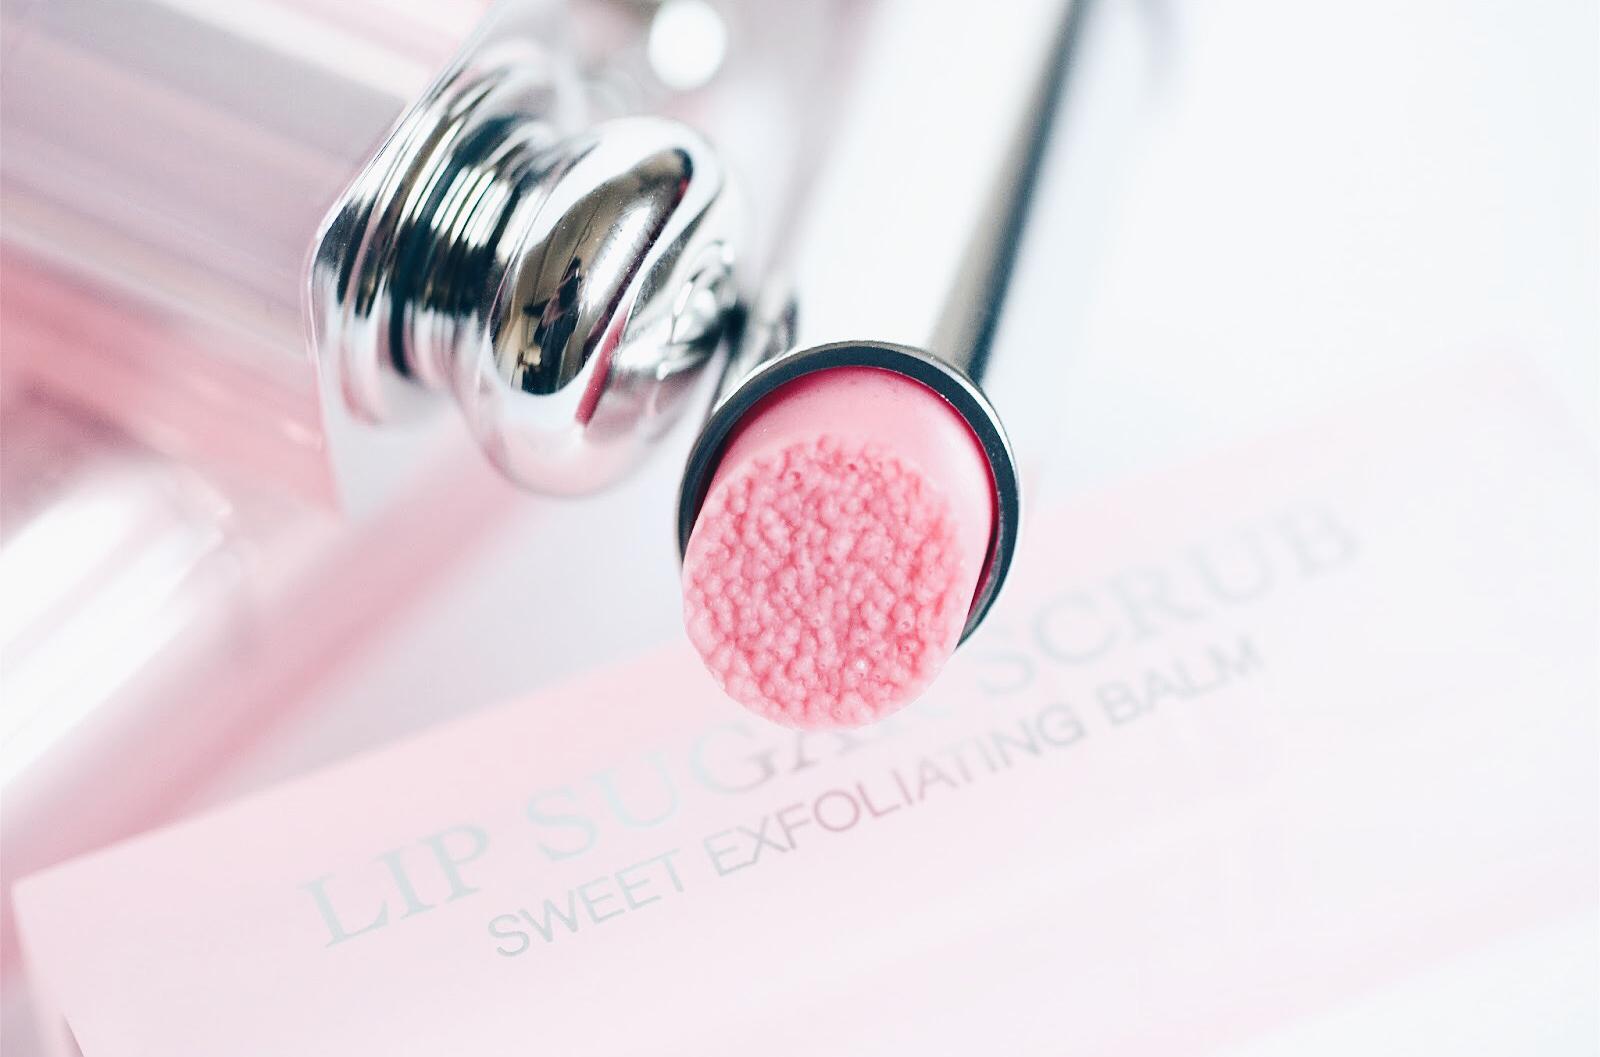 dior lip sugar scrub exfoliant lèvres avis test